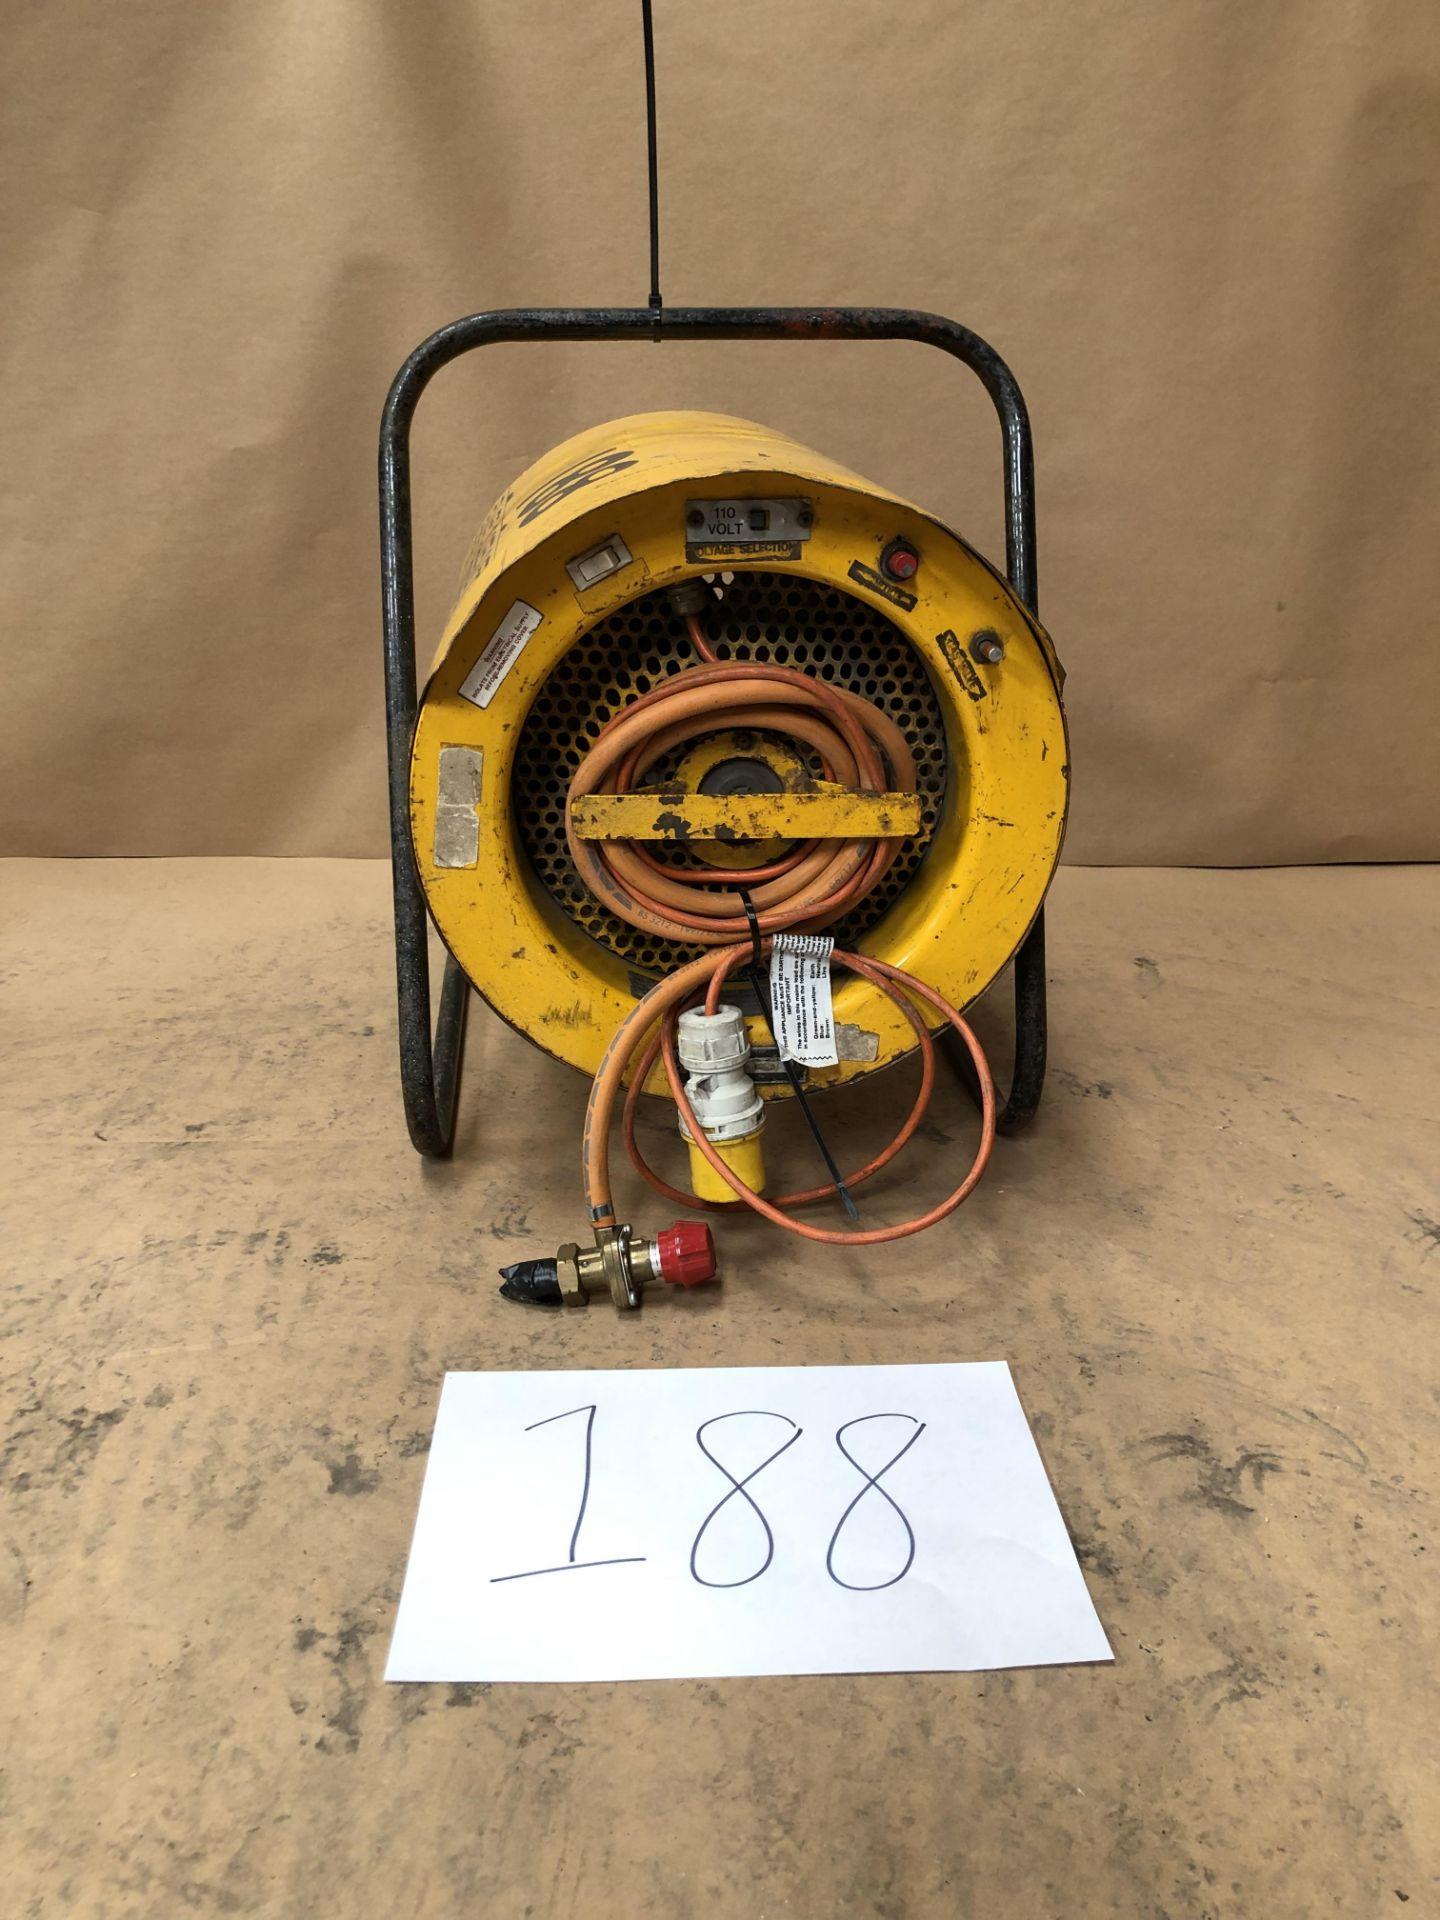 Easyheater 145, Propane Heater - Image 2 of 3